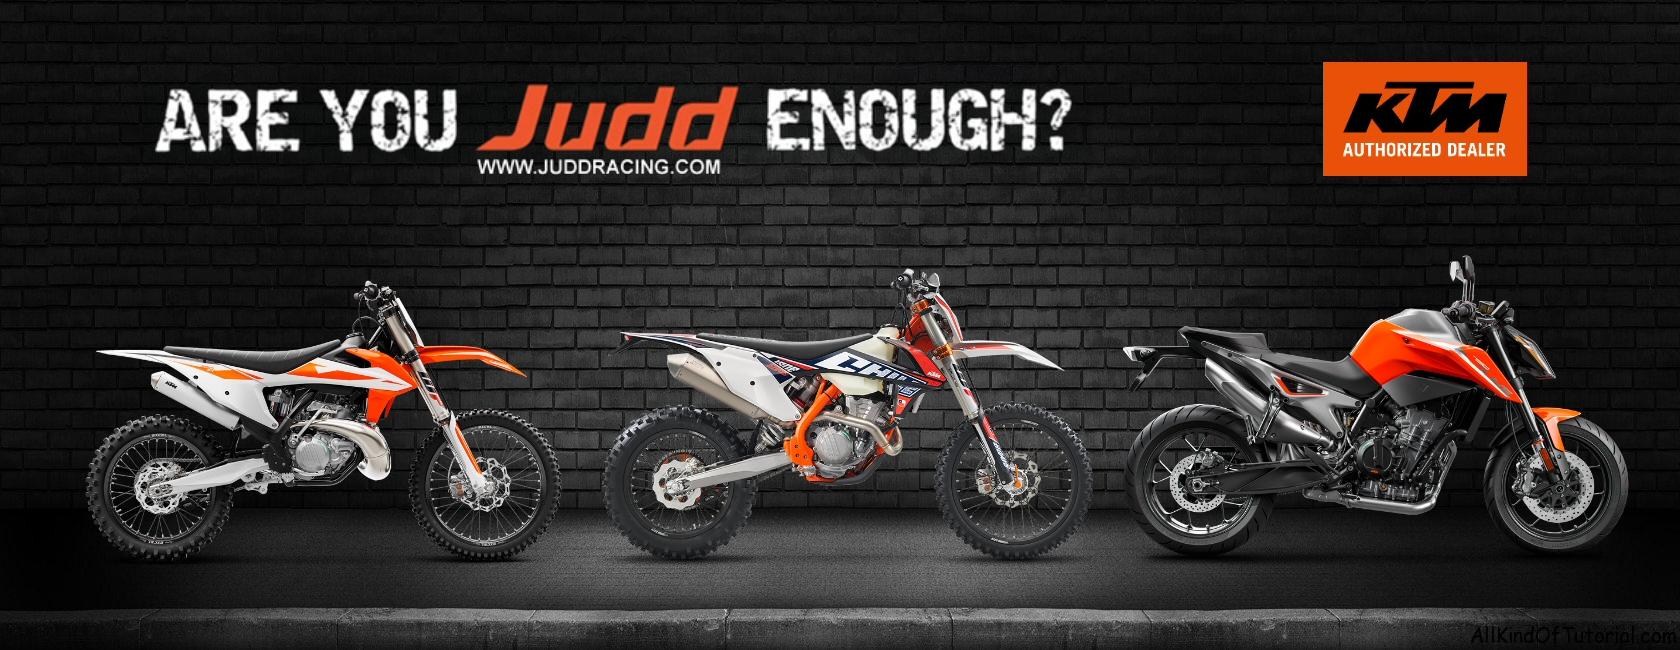 JUDD RACING KTM RANGE